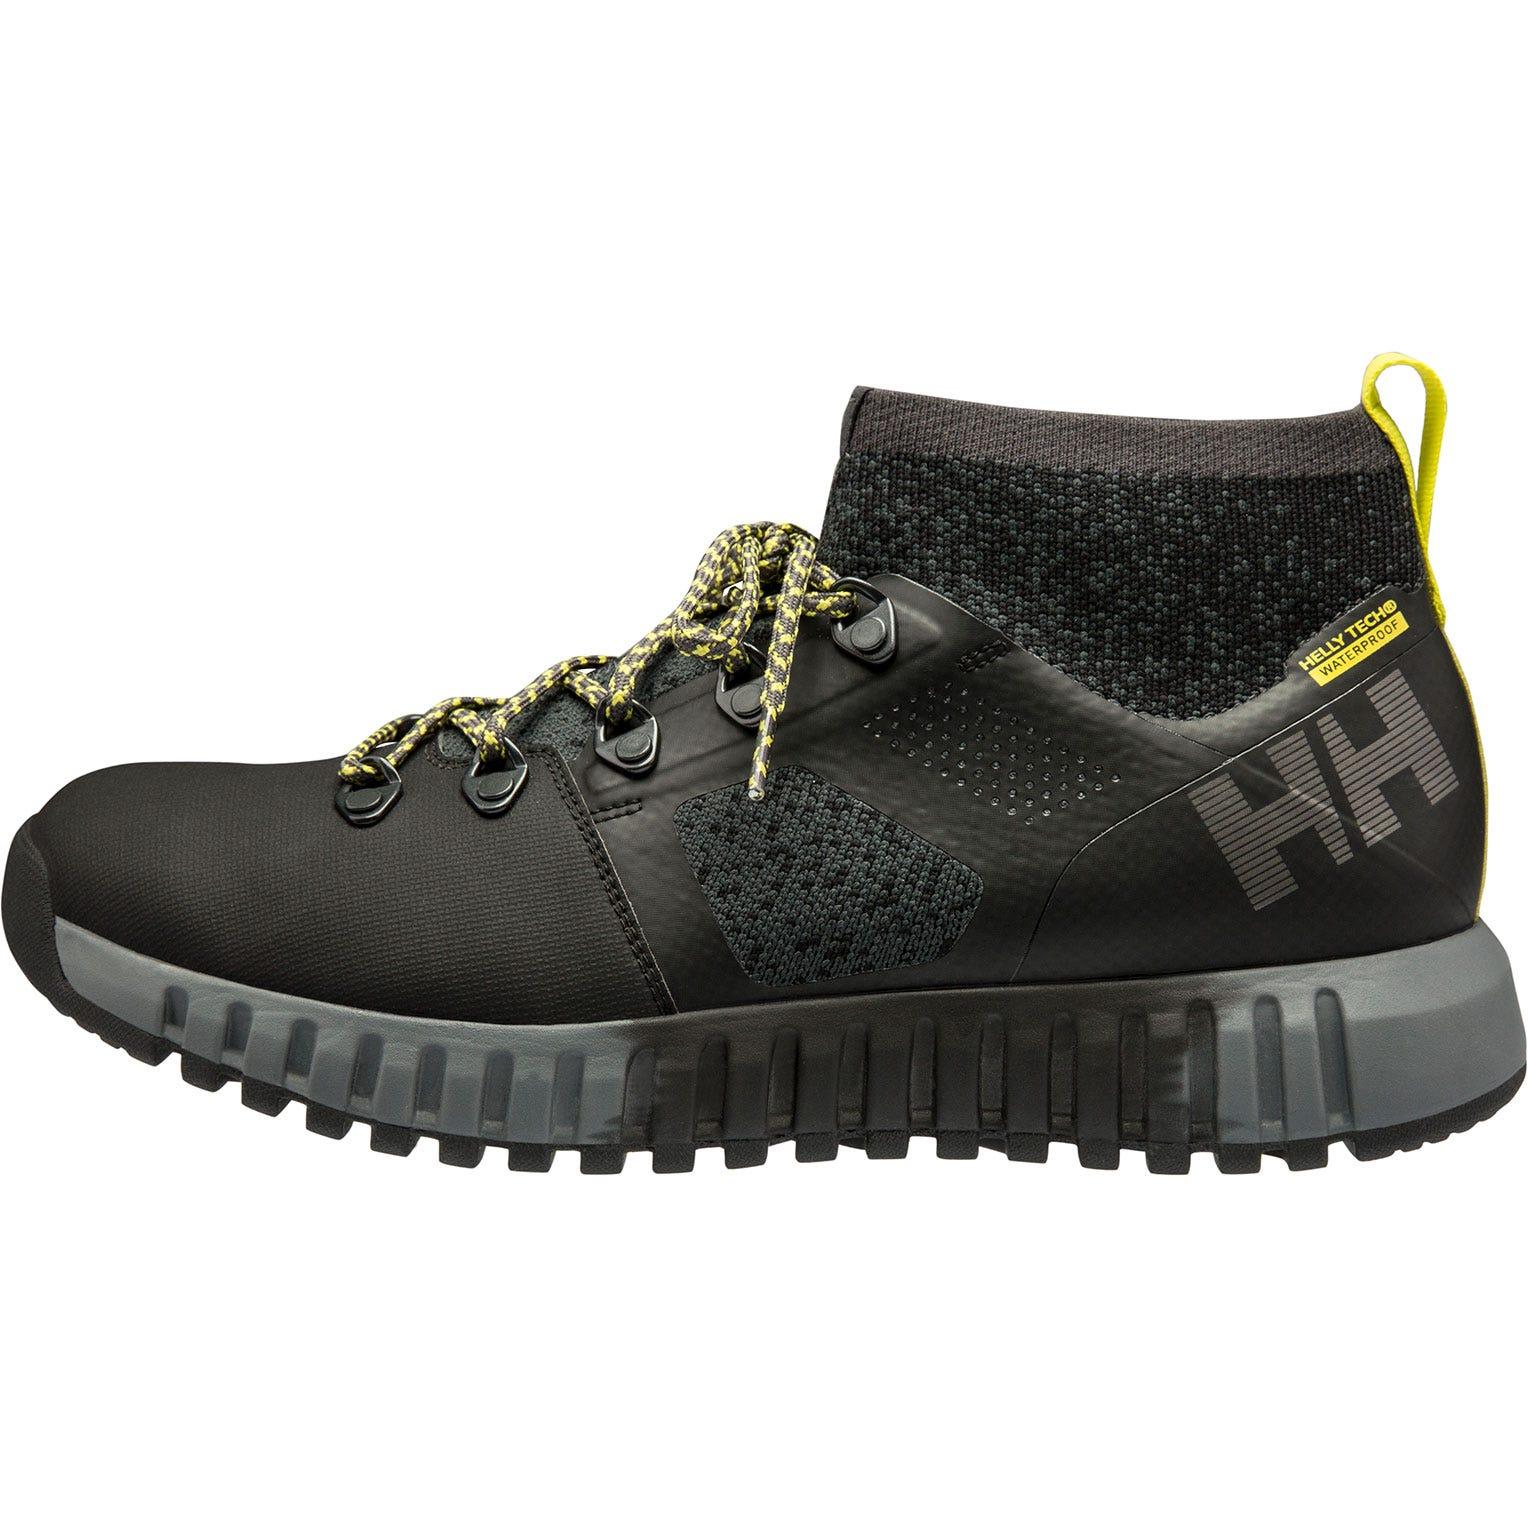 Helly Hansen Vanir Canter Ht Mens Hiking Boot Black 44.5/10.5